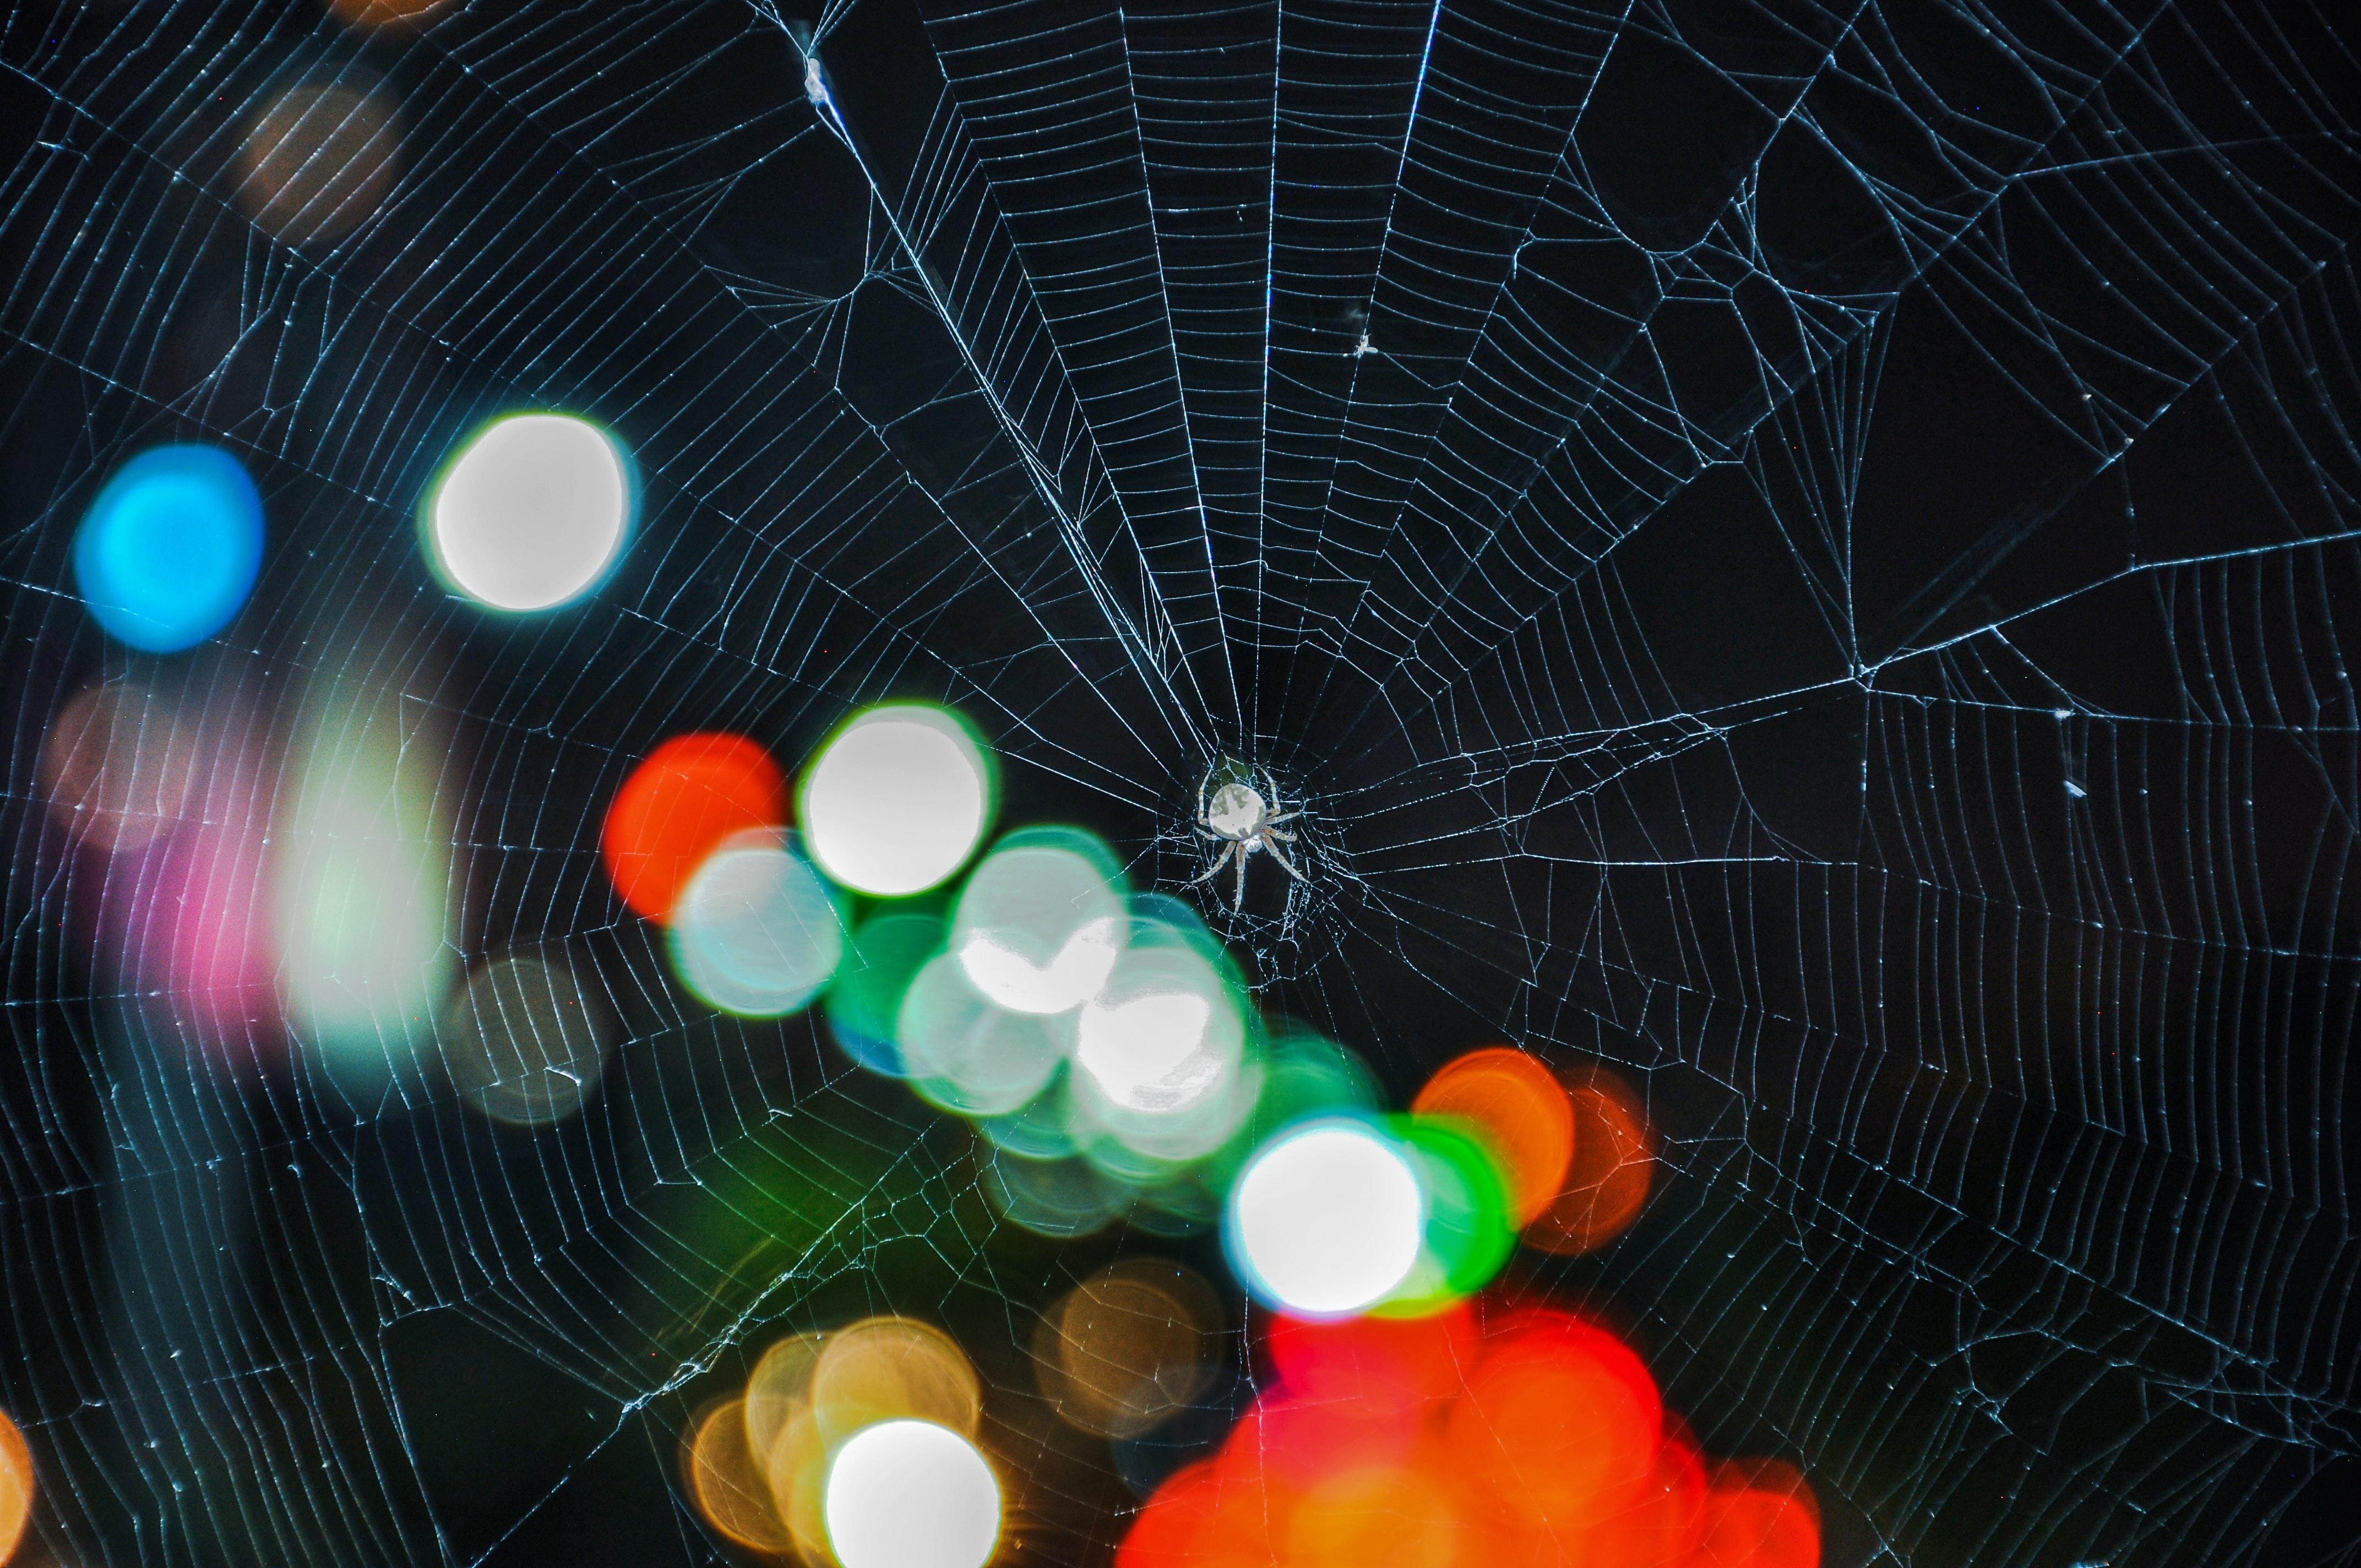 Dark Web Drug Dealer Pleads Guilty to Opioid Distribution